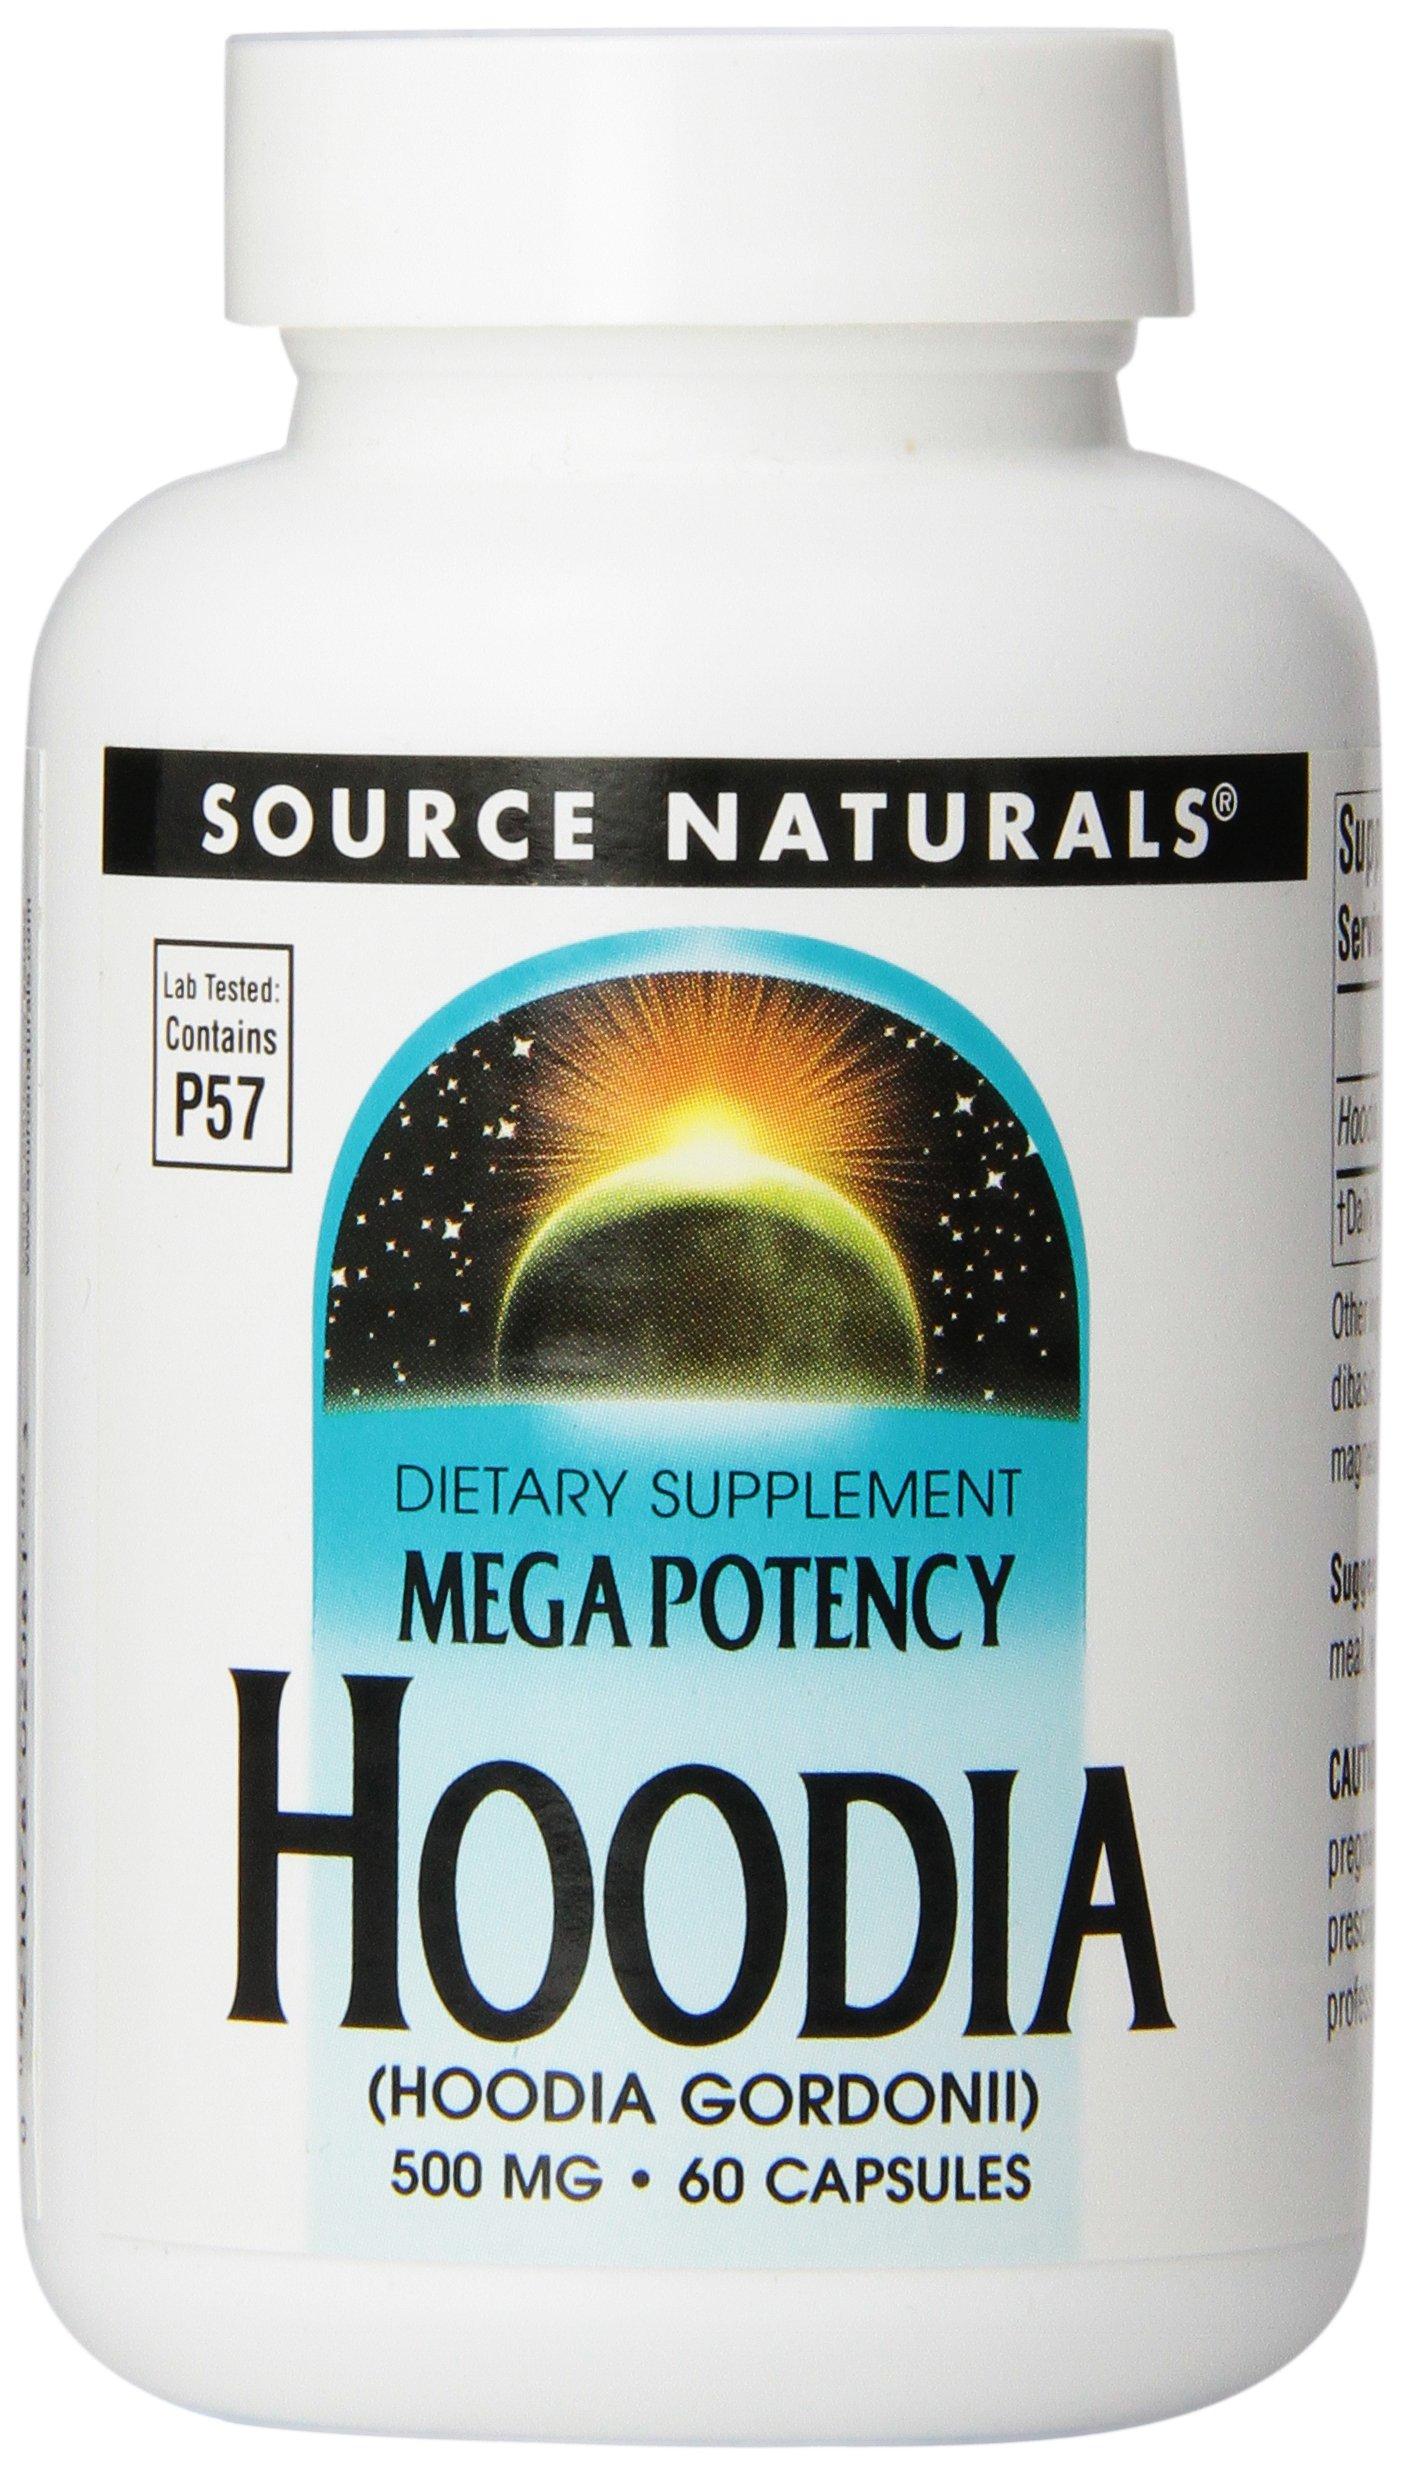 Source Naturals Mega Potency Hoodia, 500mg, 60 Capsules